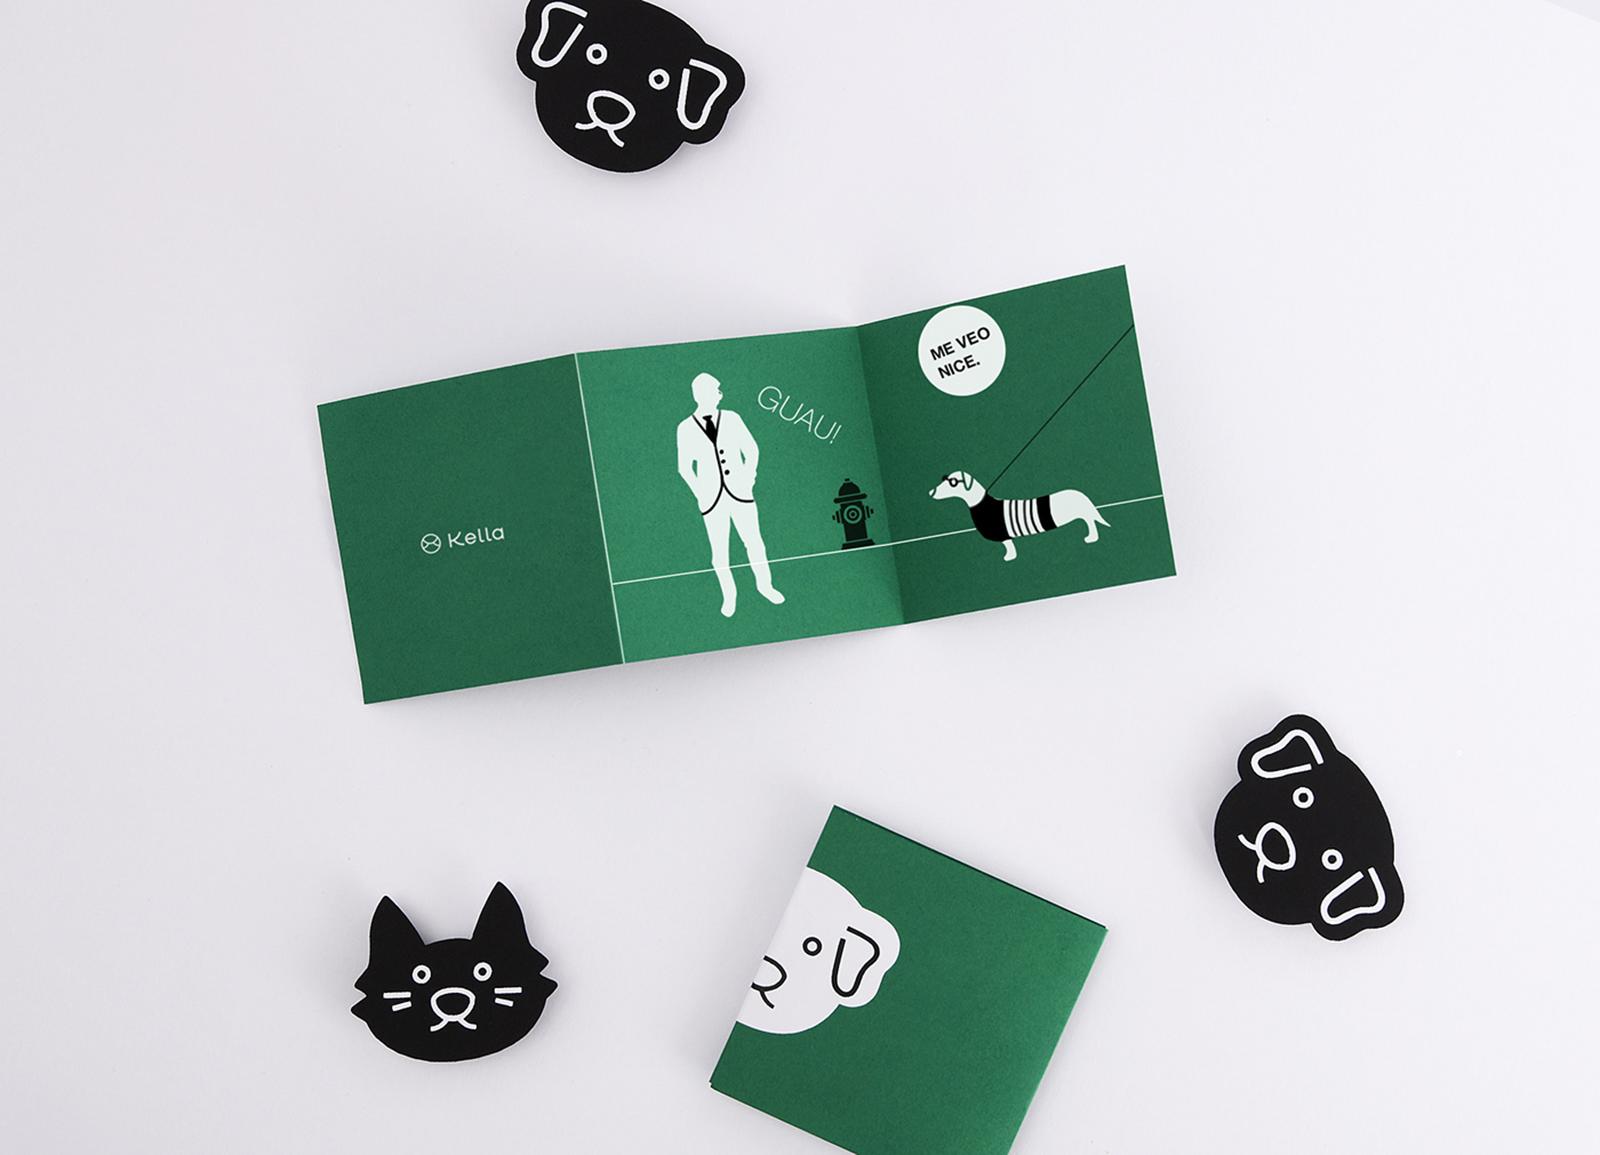 Kella宠物食品品牌视觉VI形象设计欣赏-深圳VI设计6